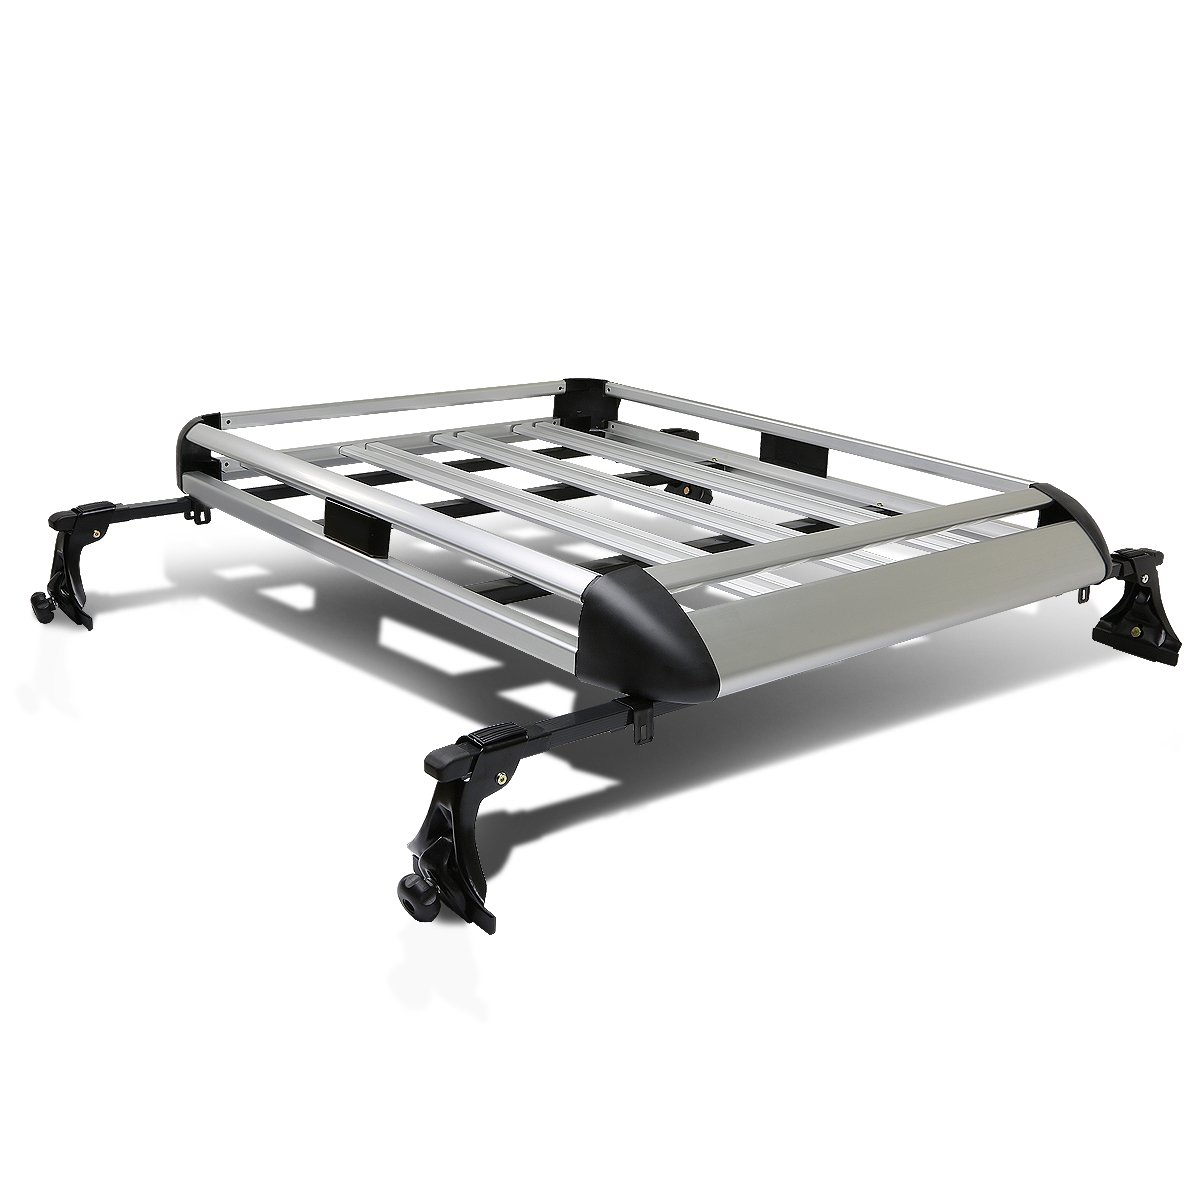 50' x 38' Aluminum Roof Rack Top Cargo Carrier Basket+Cross Bar (Silver) Auto Dynasty